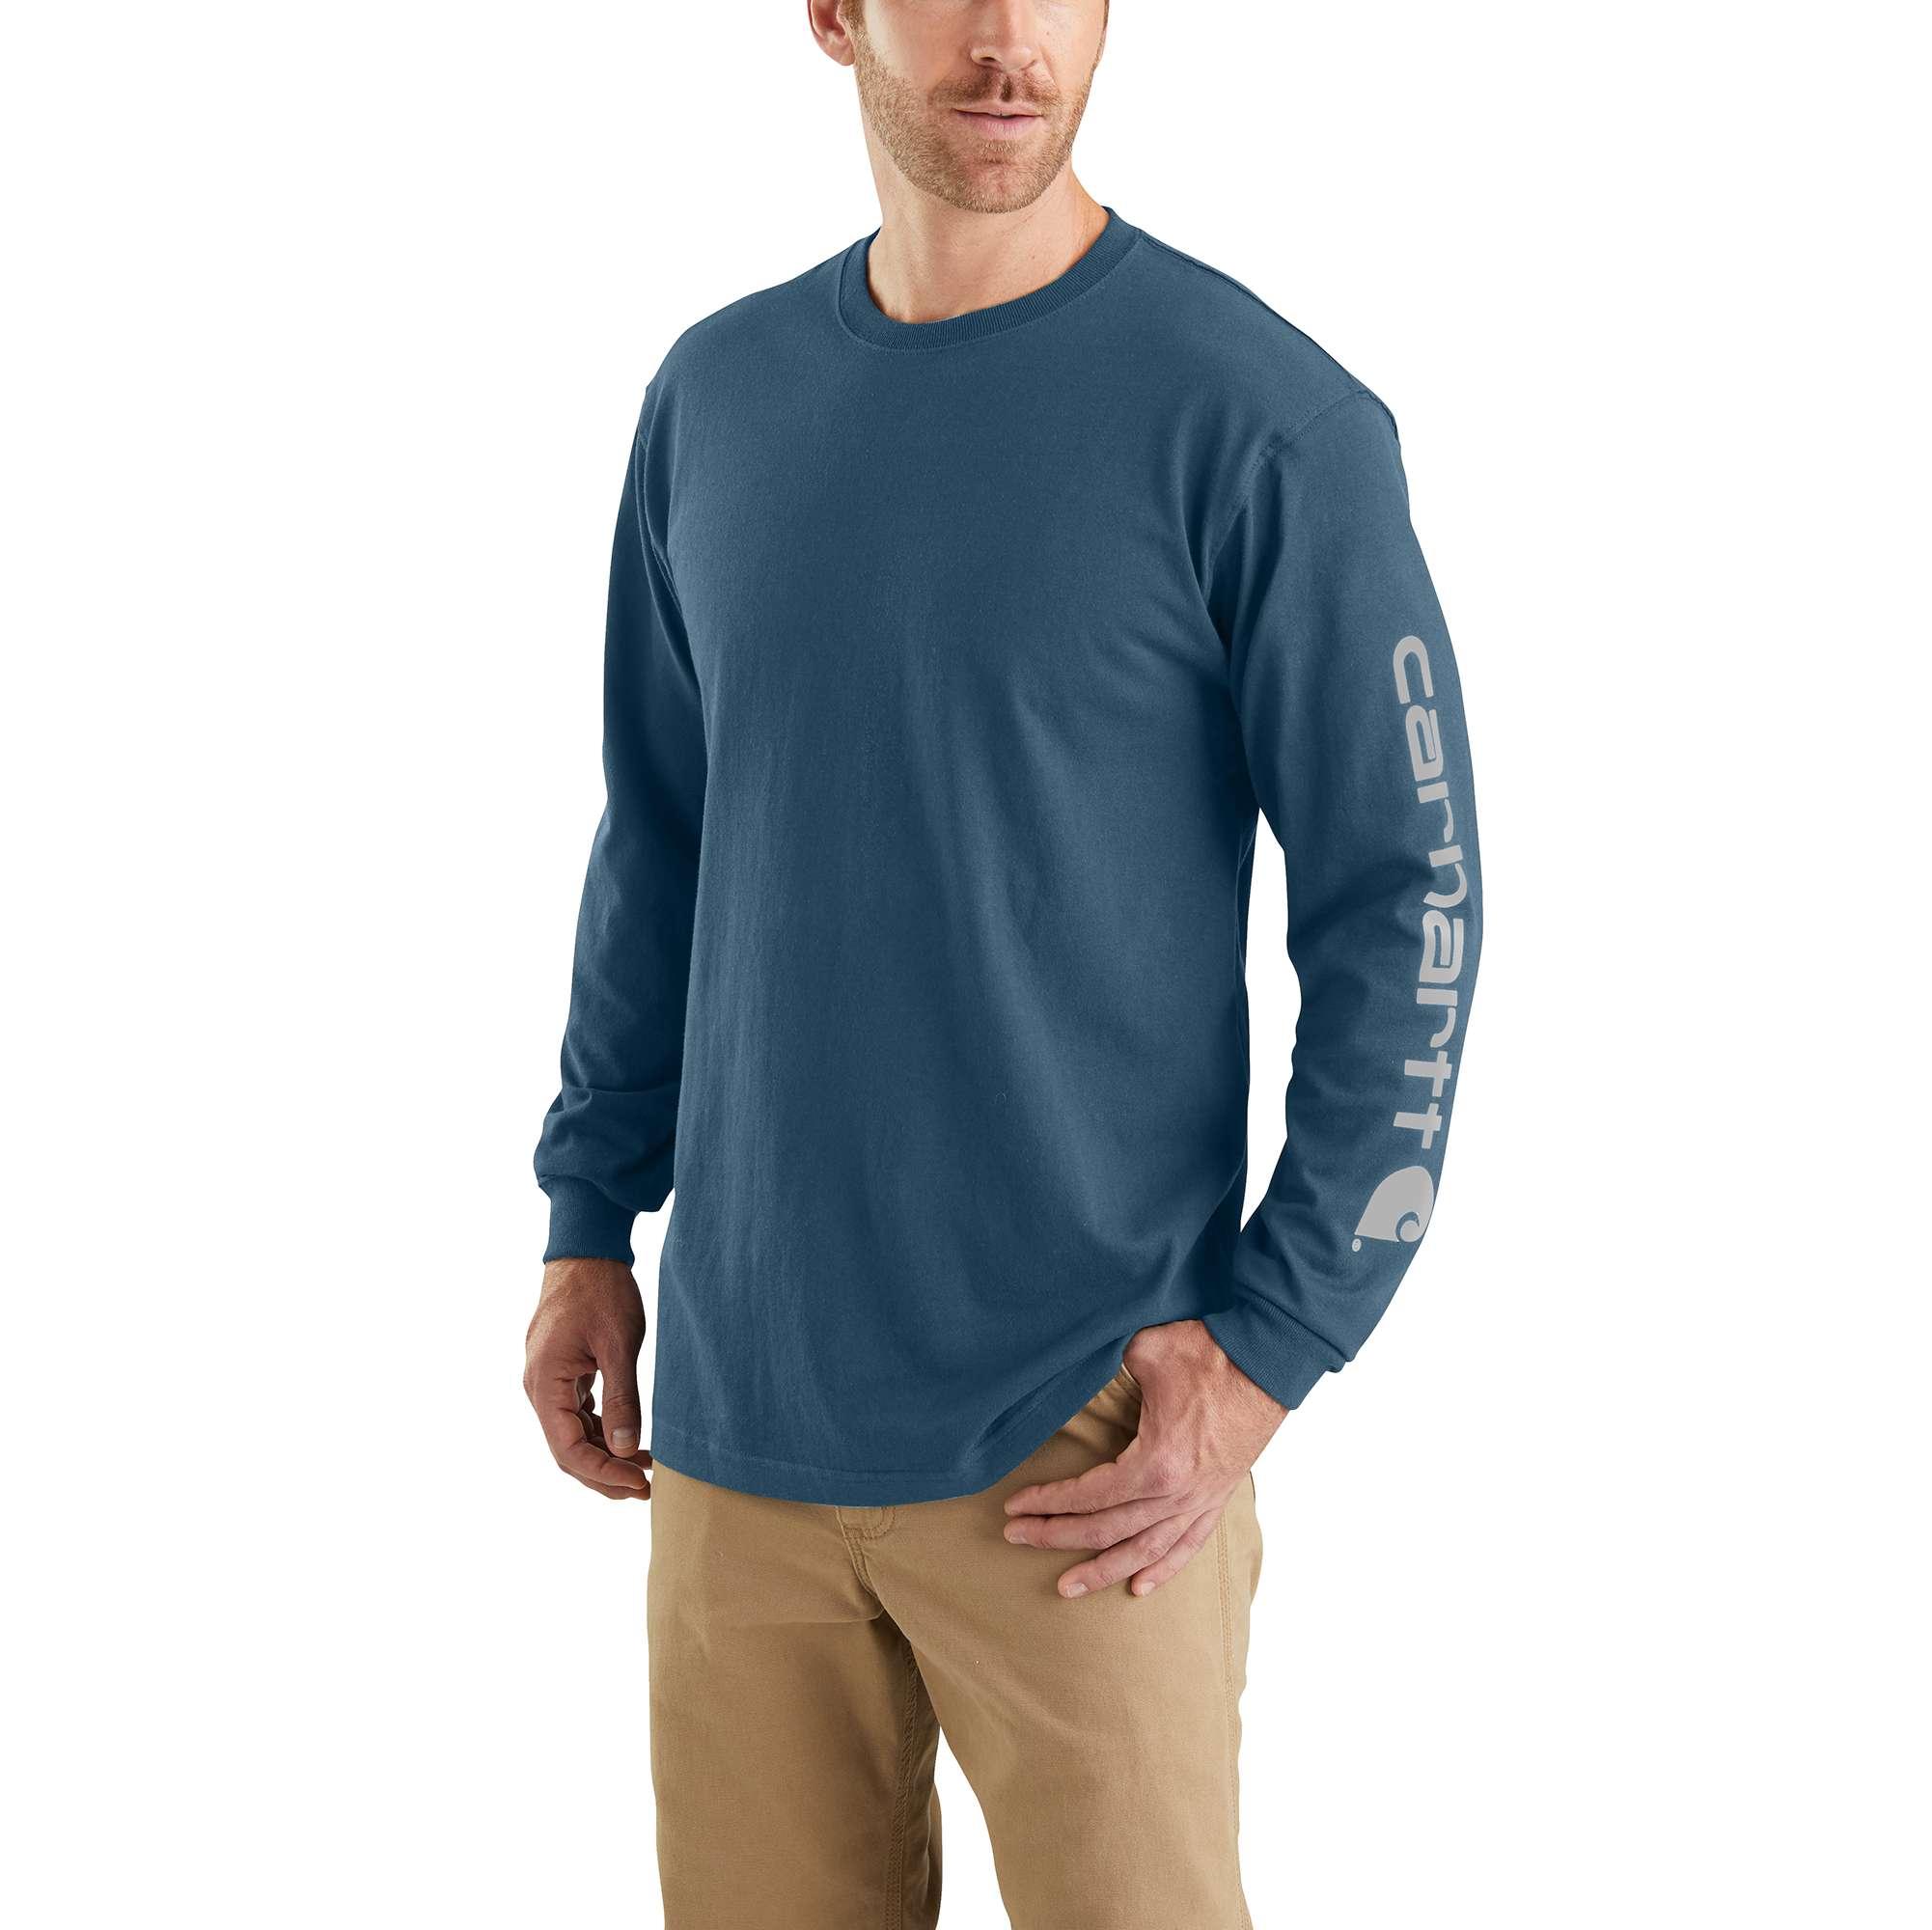 Men's Workwear Long-Sleeve Graphic Logo T-Shirt, Blue, swatch